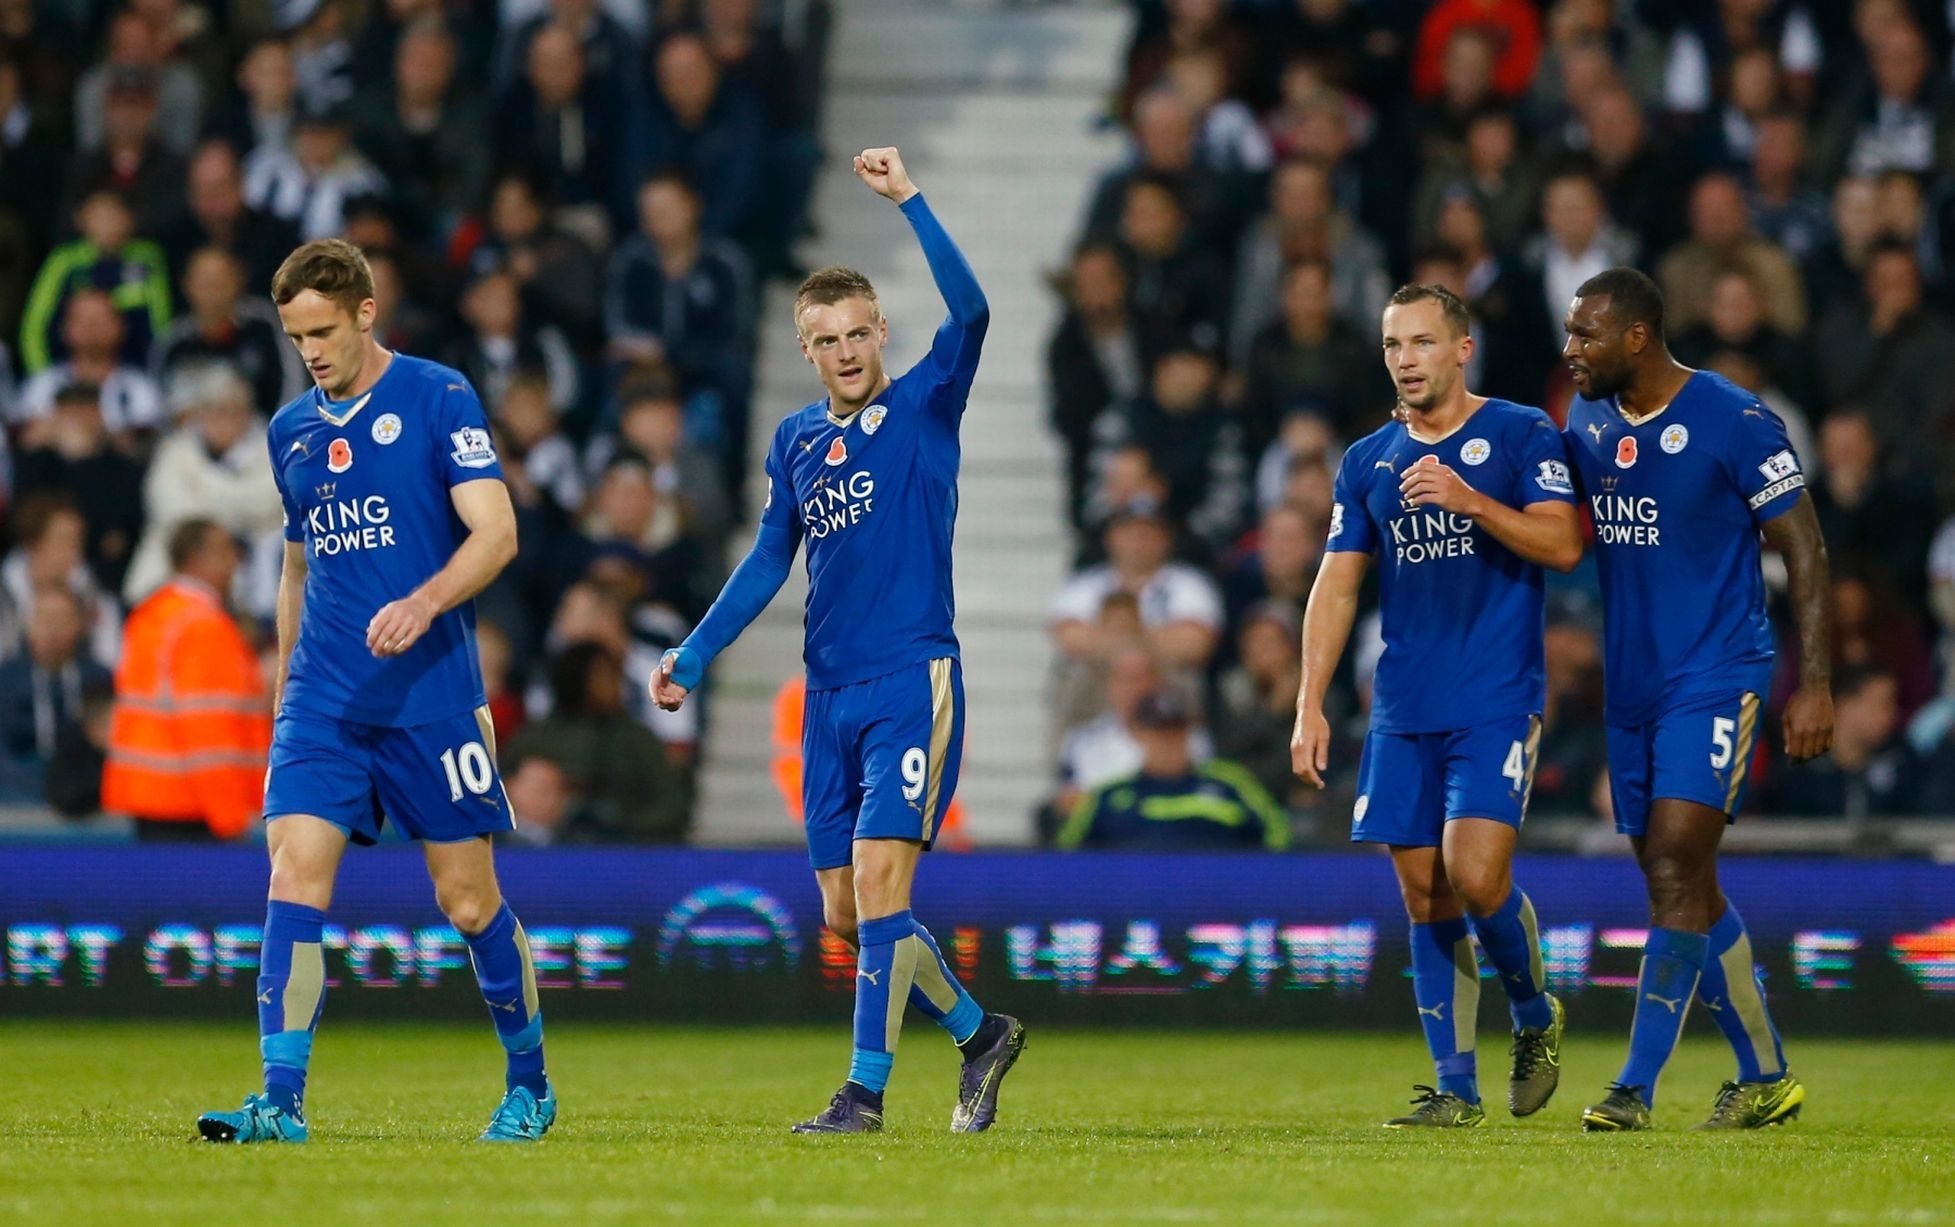 Leicester Premier League: una favola che attrae anche Hollywood